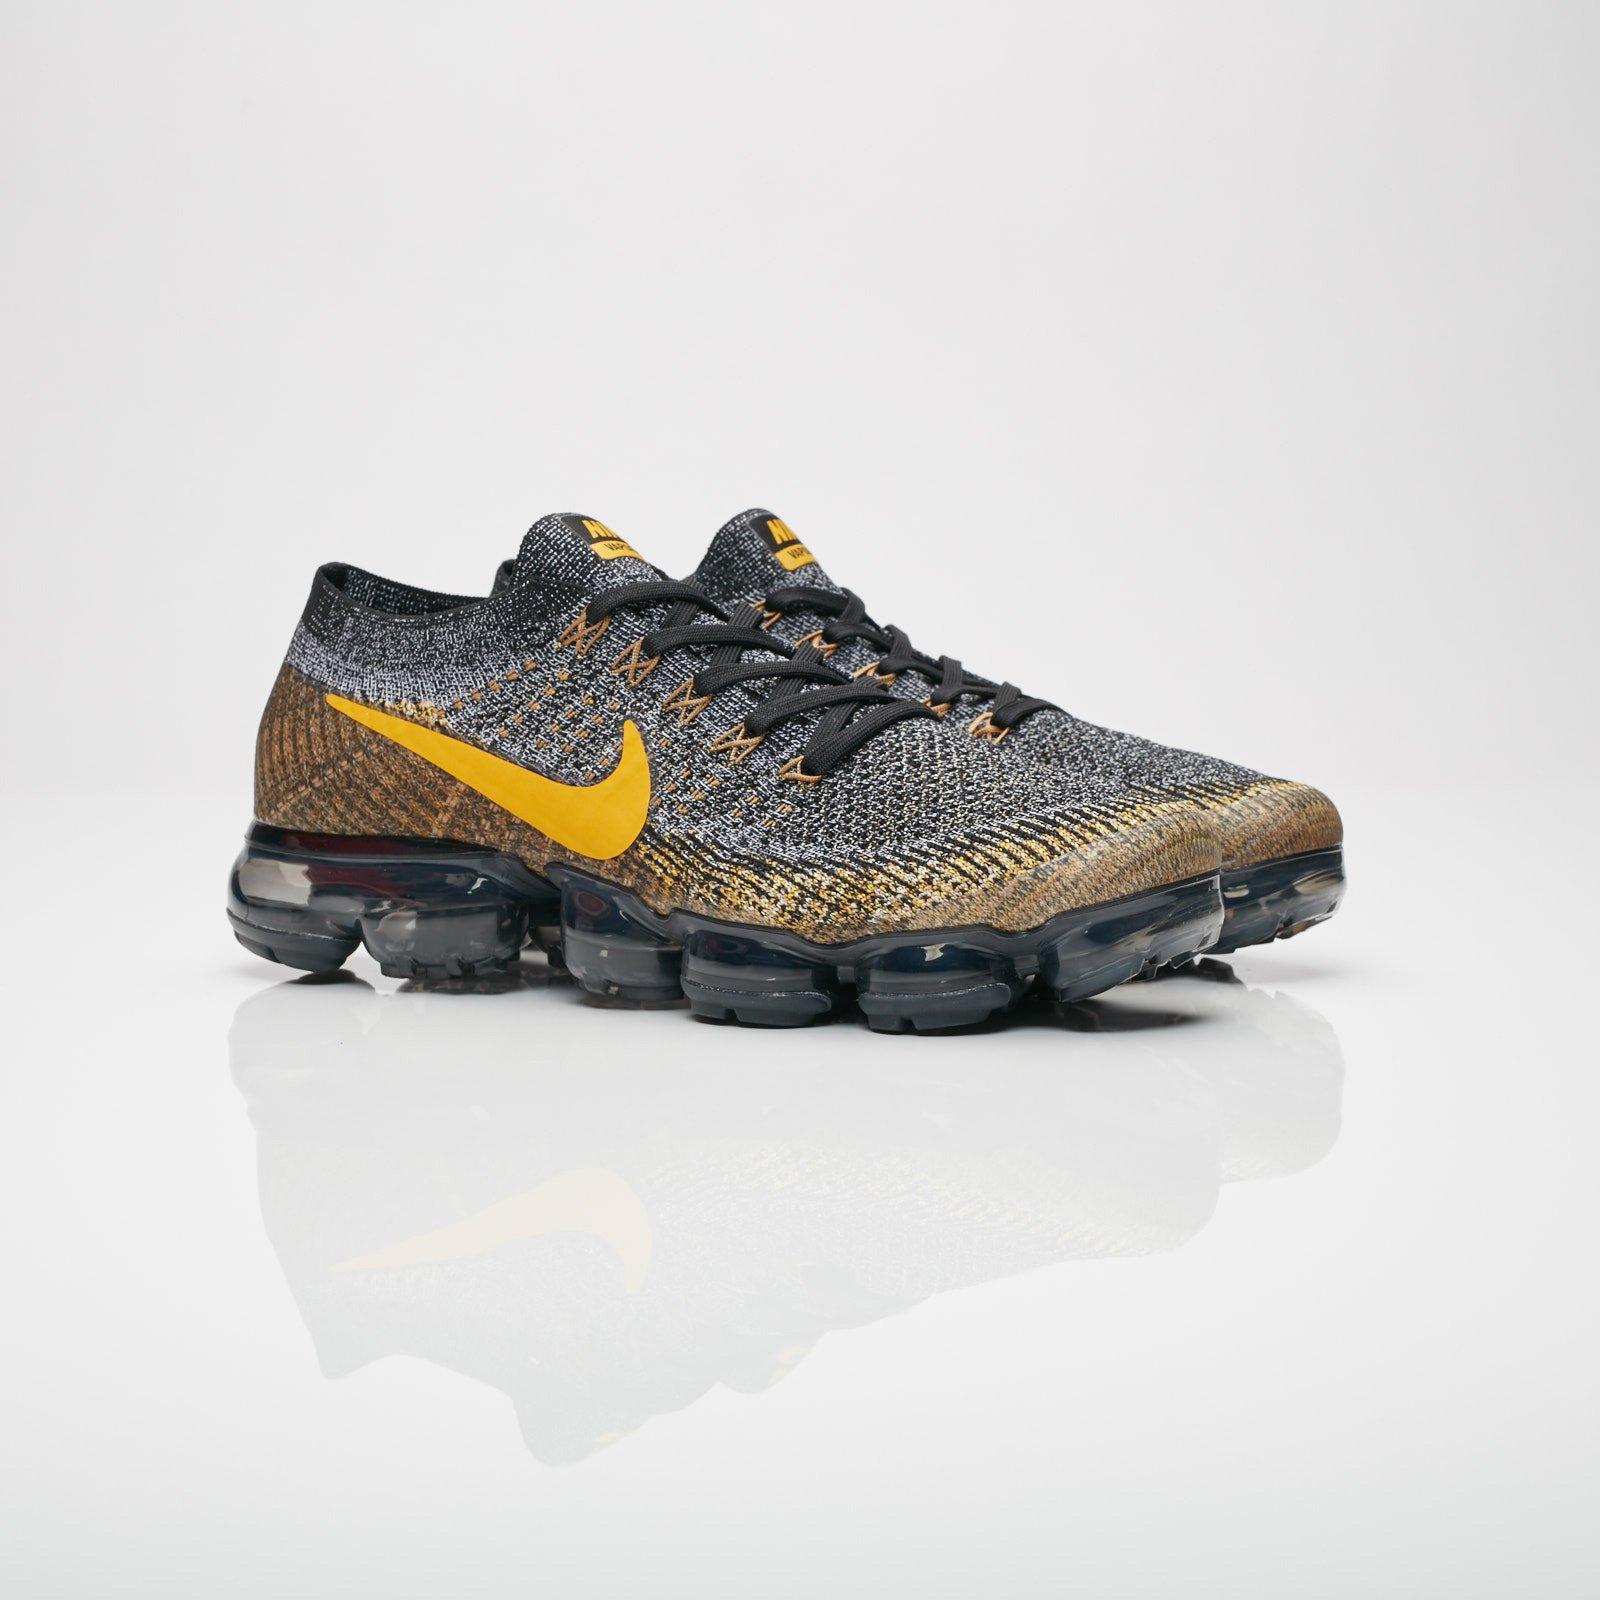 ed50b726d532 Nike Air Vapormax Flyknit - 849558-021 - Sneakersnstuff